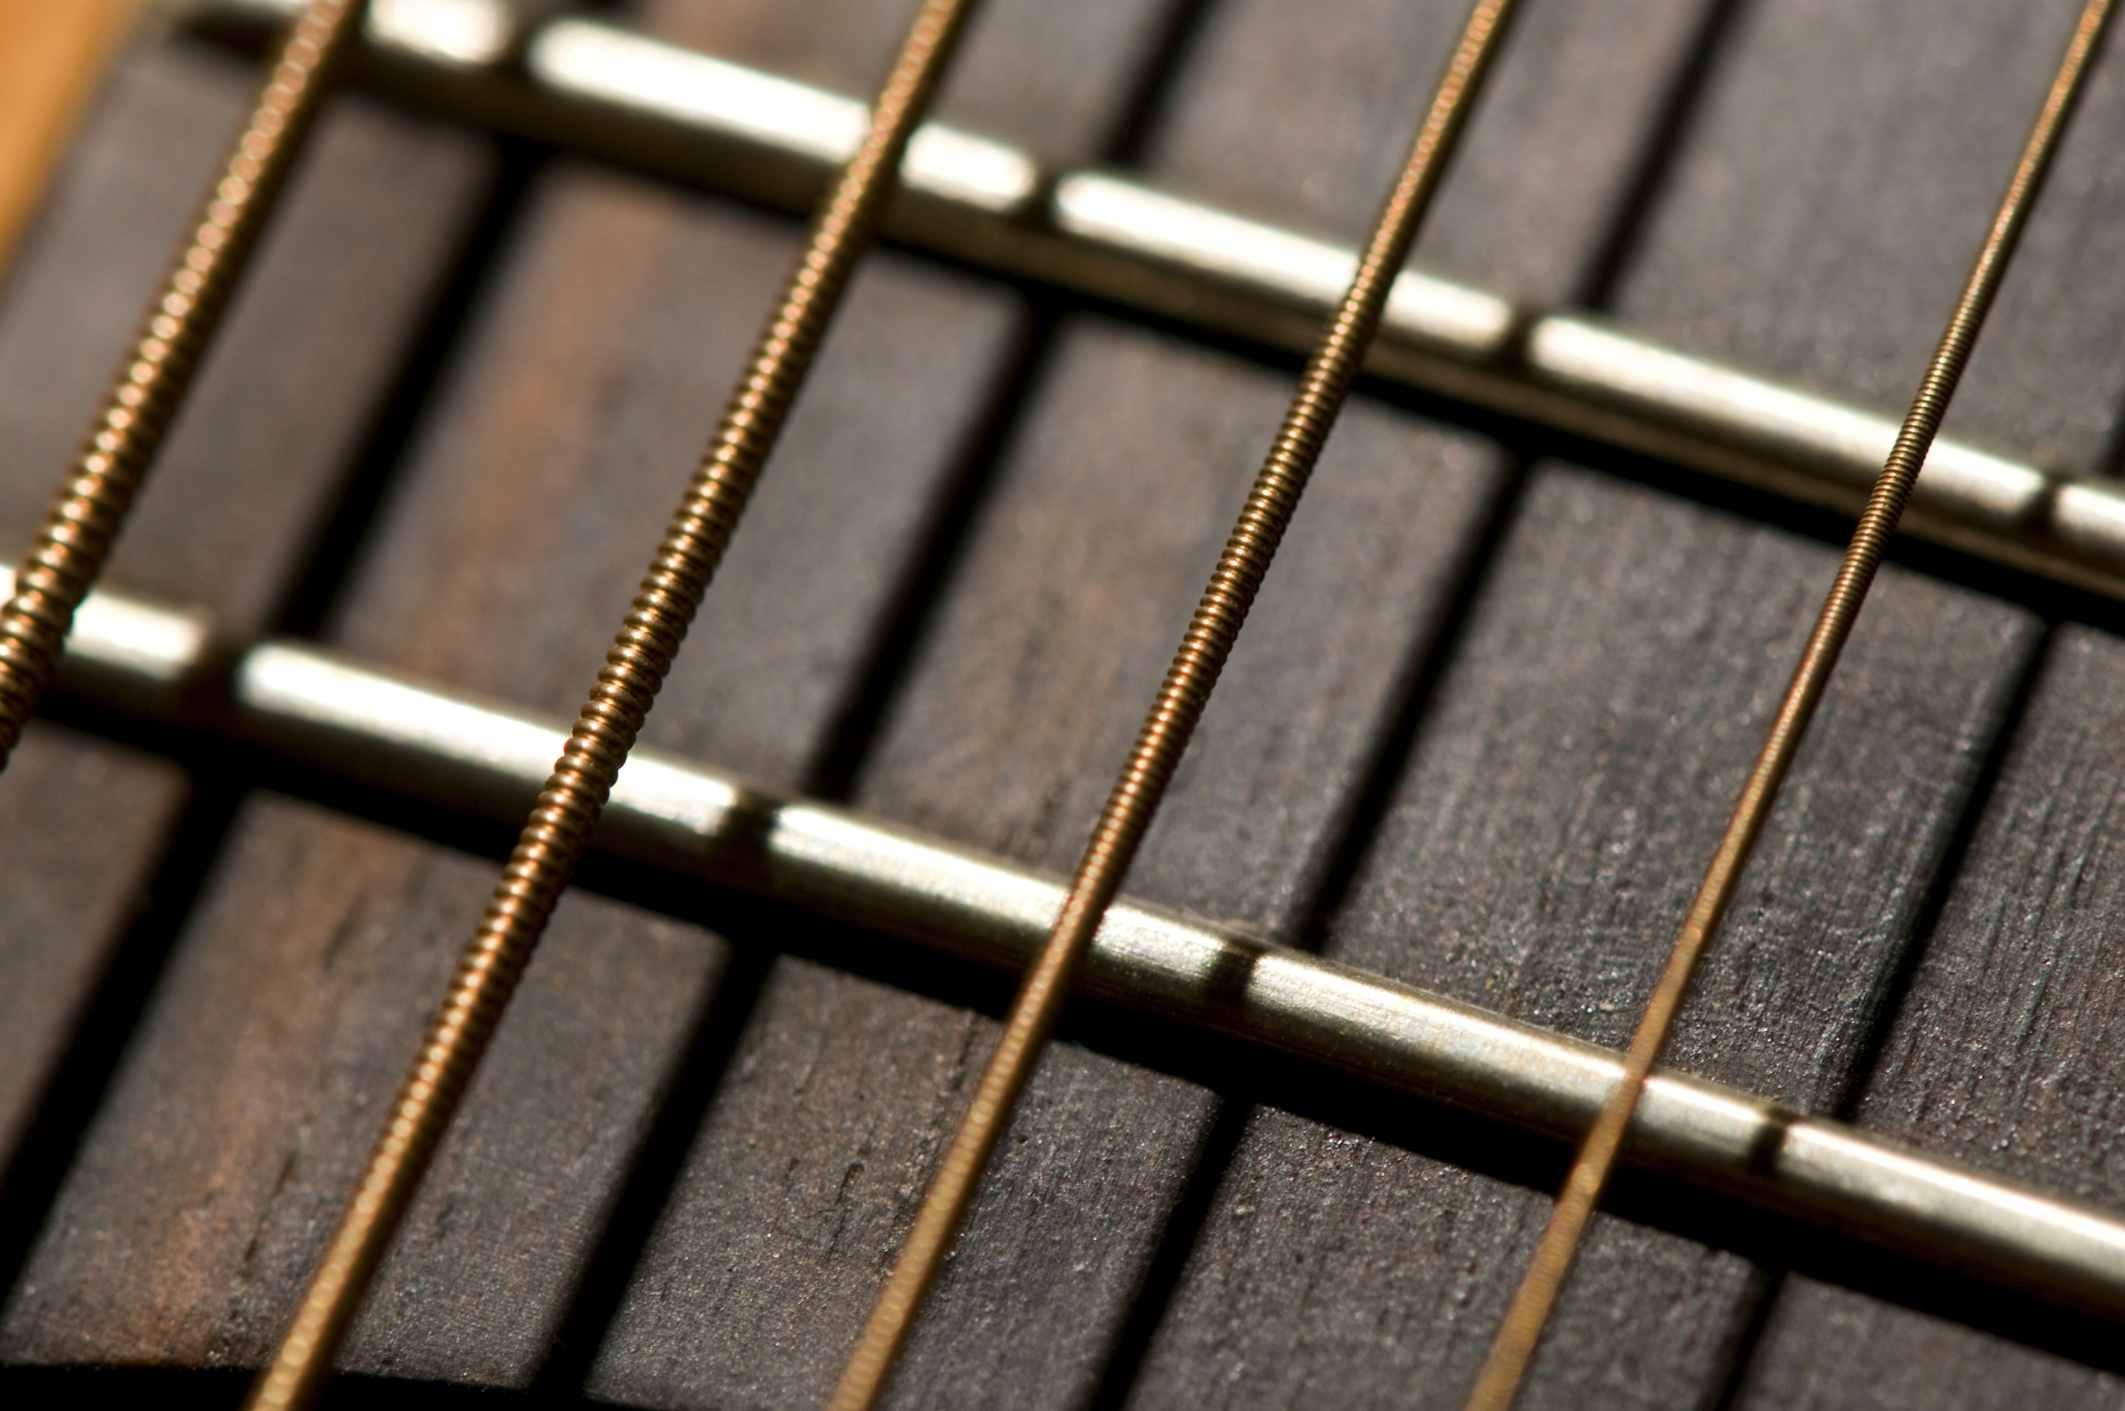 guitar strings close up